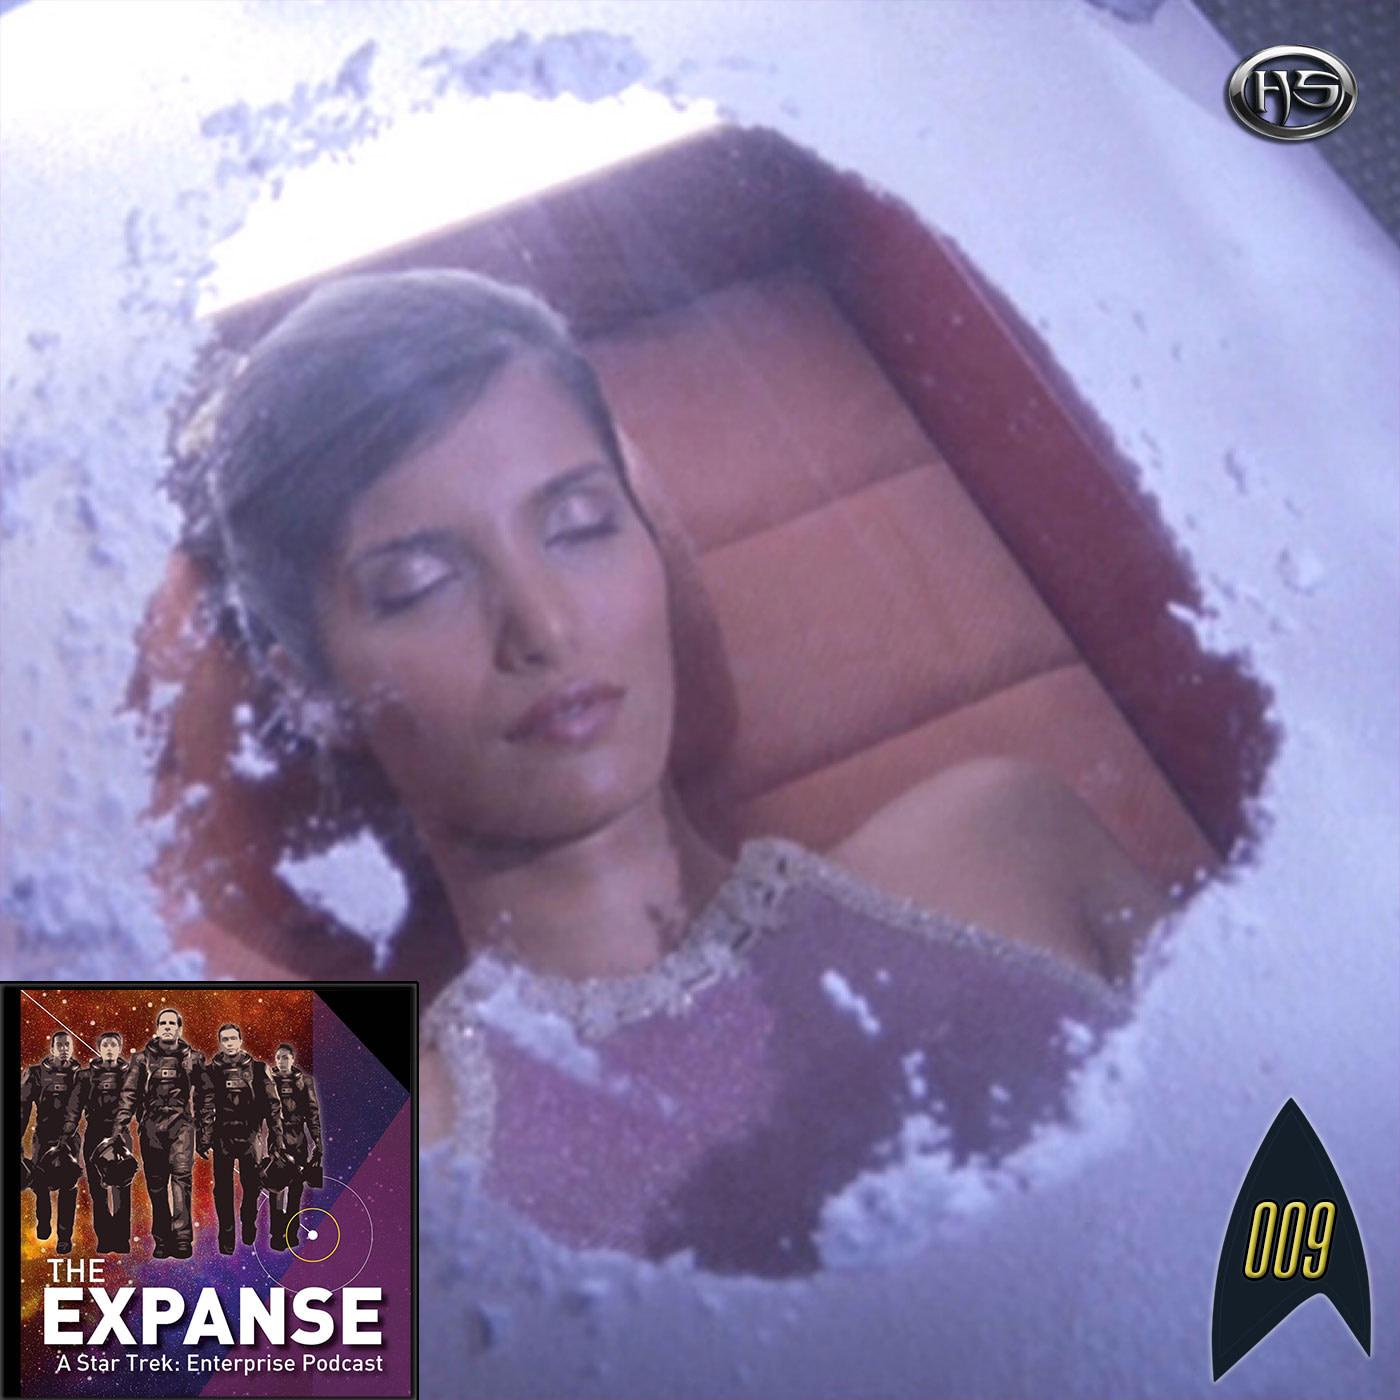 The Expanse Episode 9